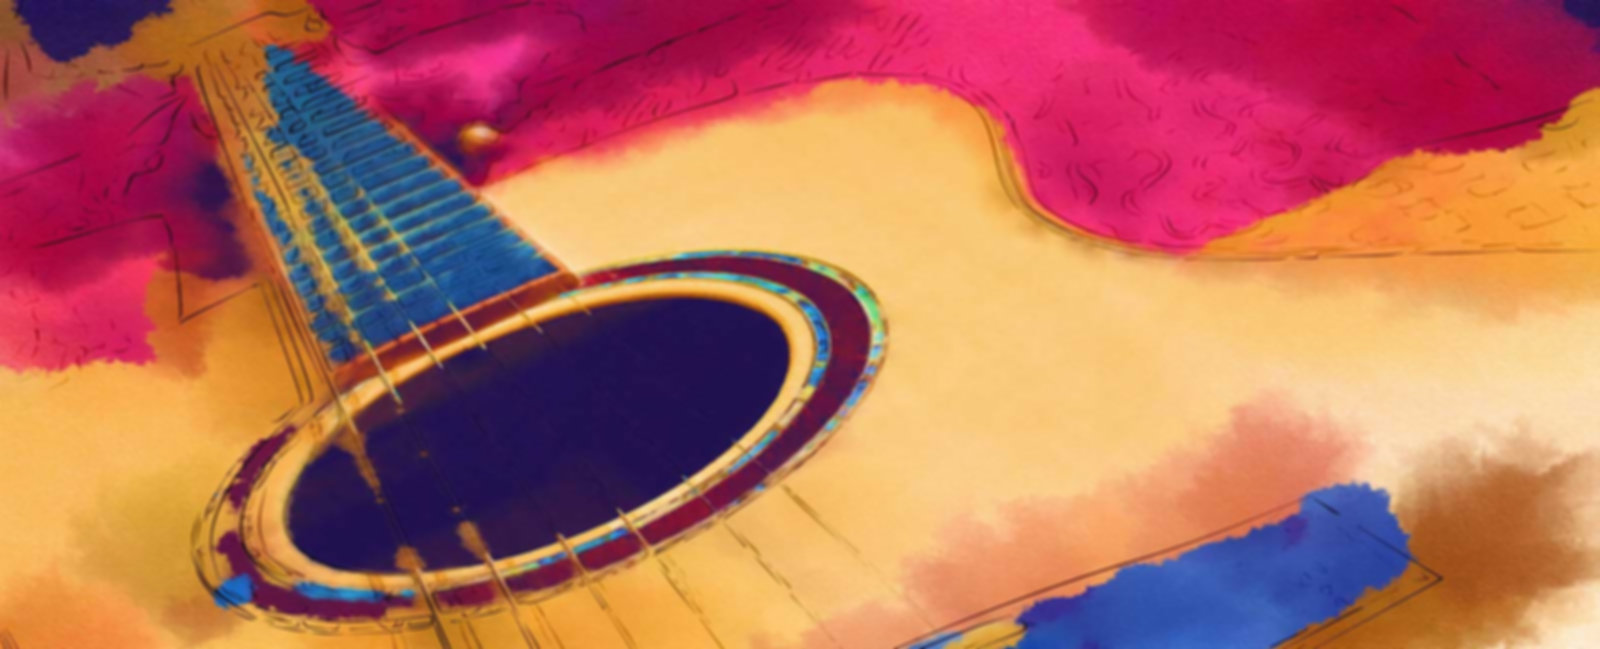 Guitar-5.jpg